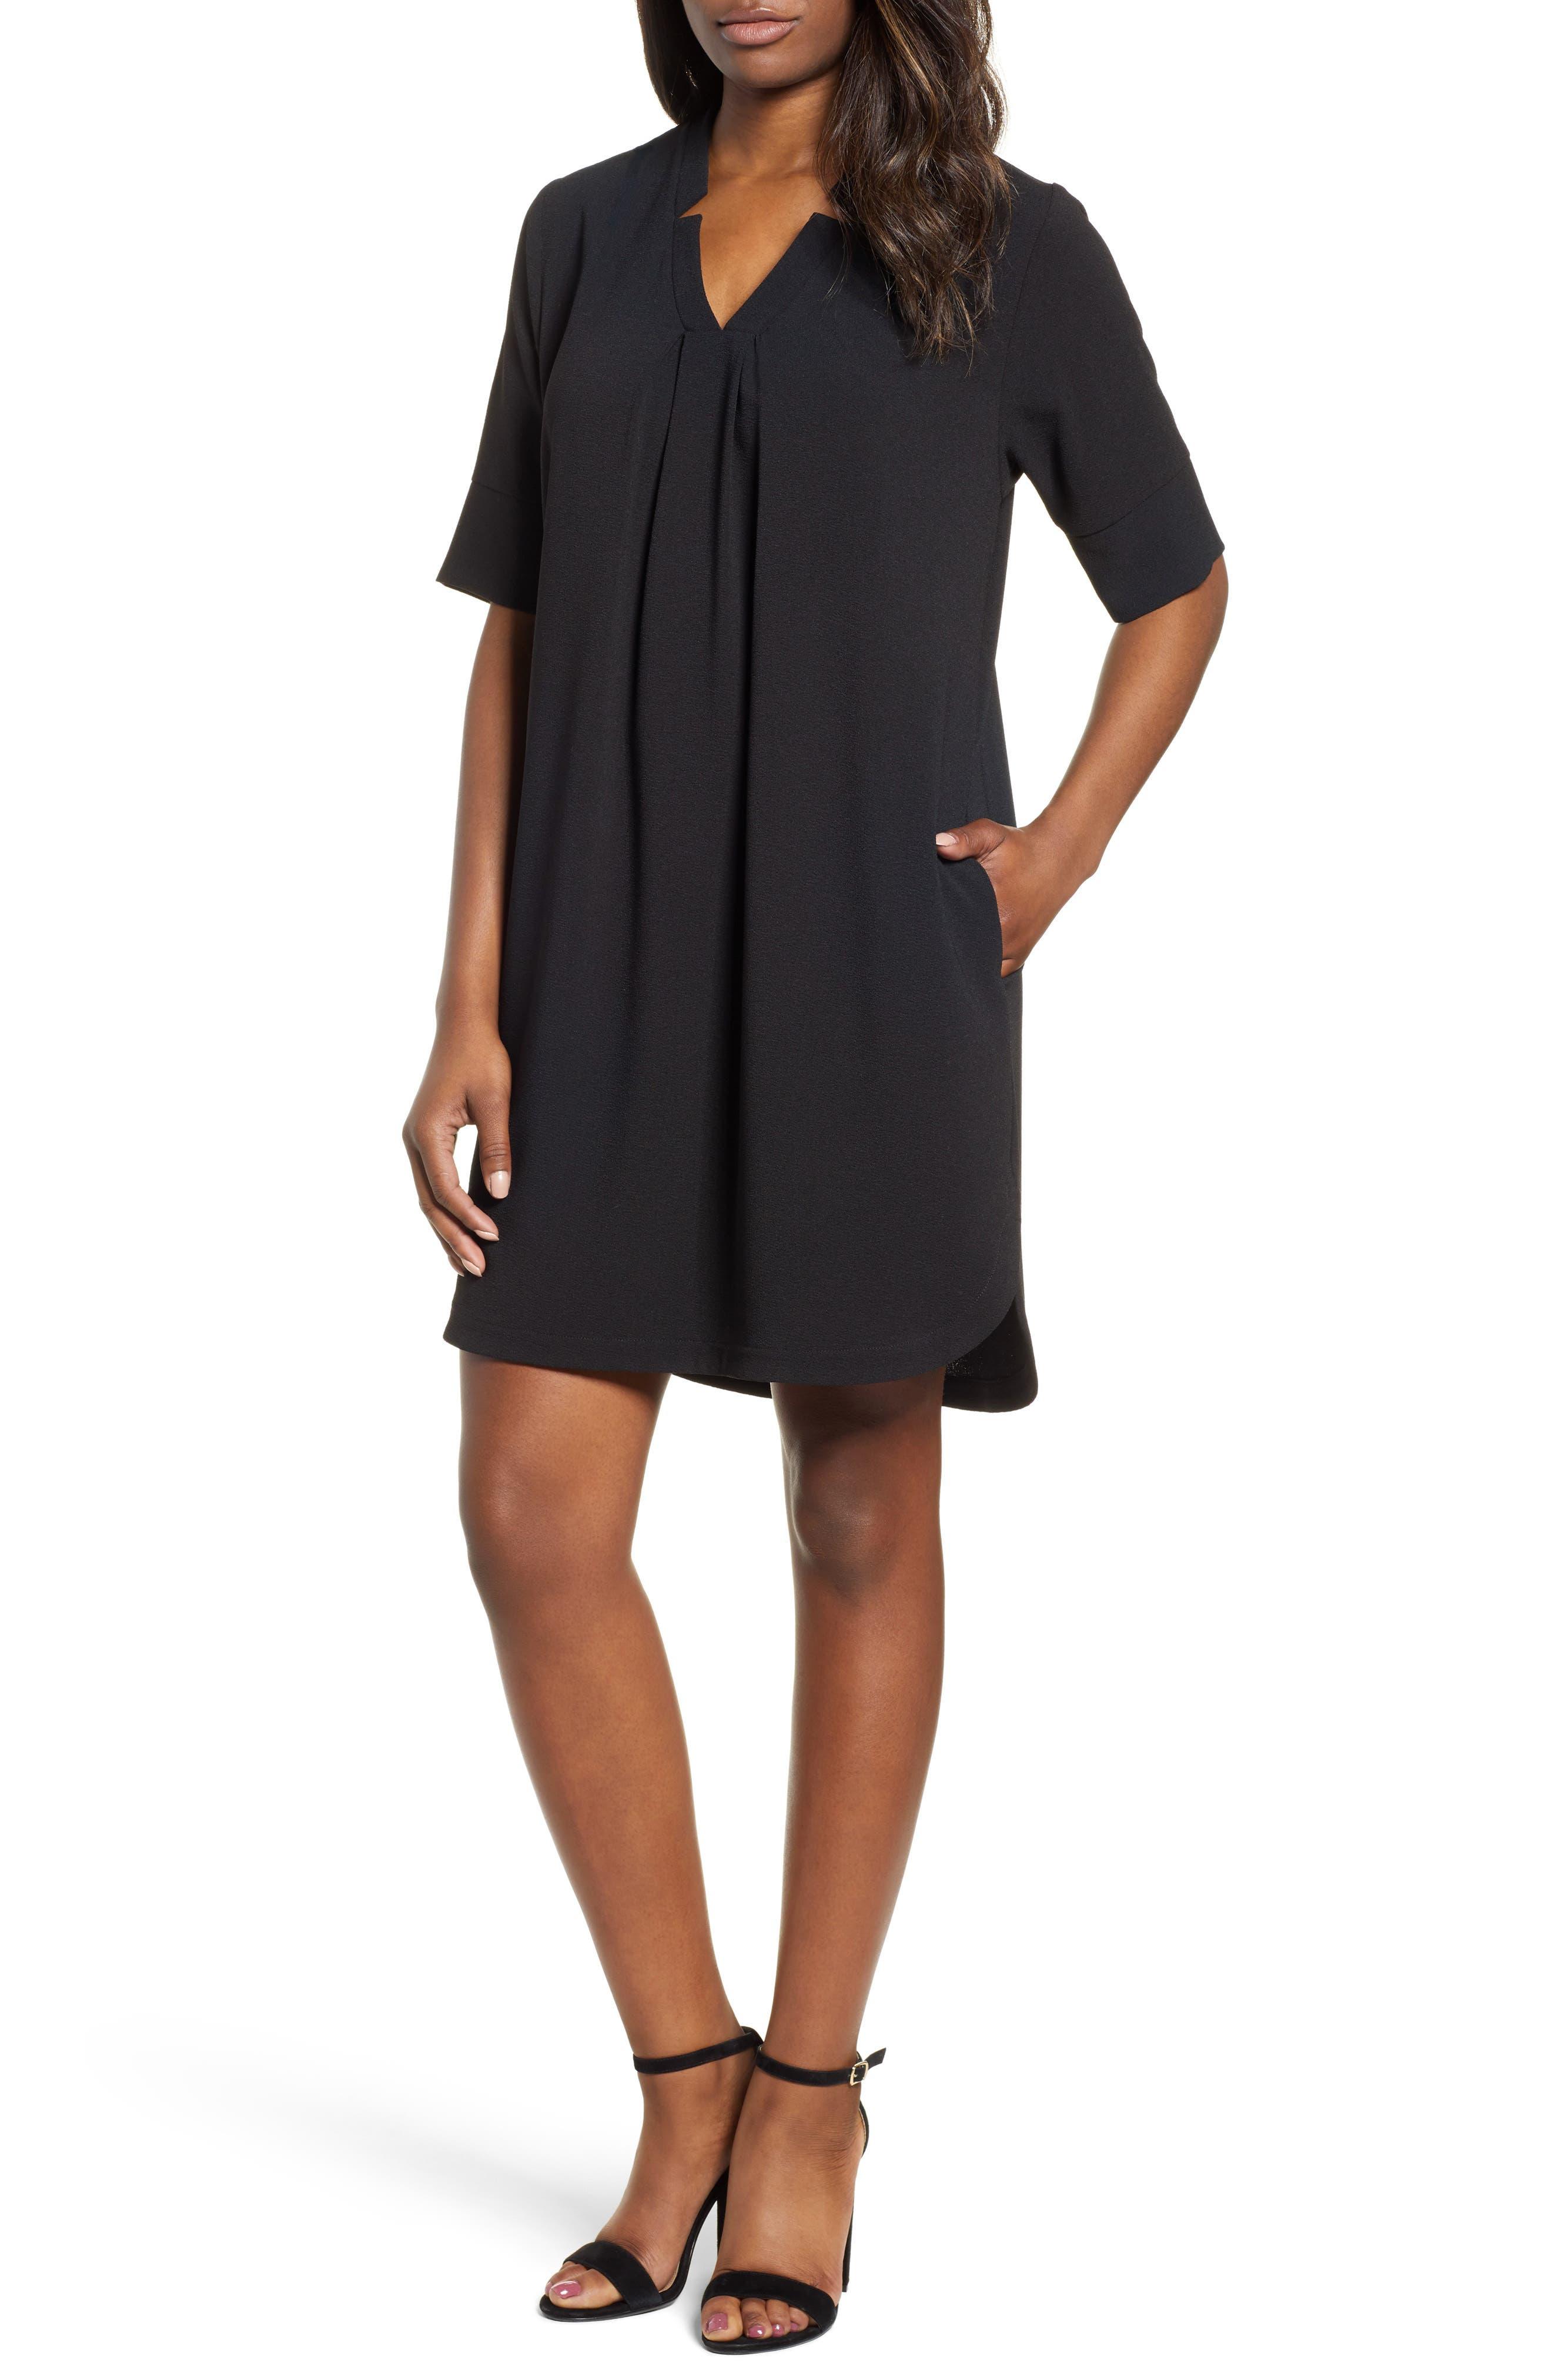 BOBEAU, Pleat Front Curved Hem Shirtdress, Main thumbnail 1, color, BLACK